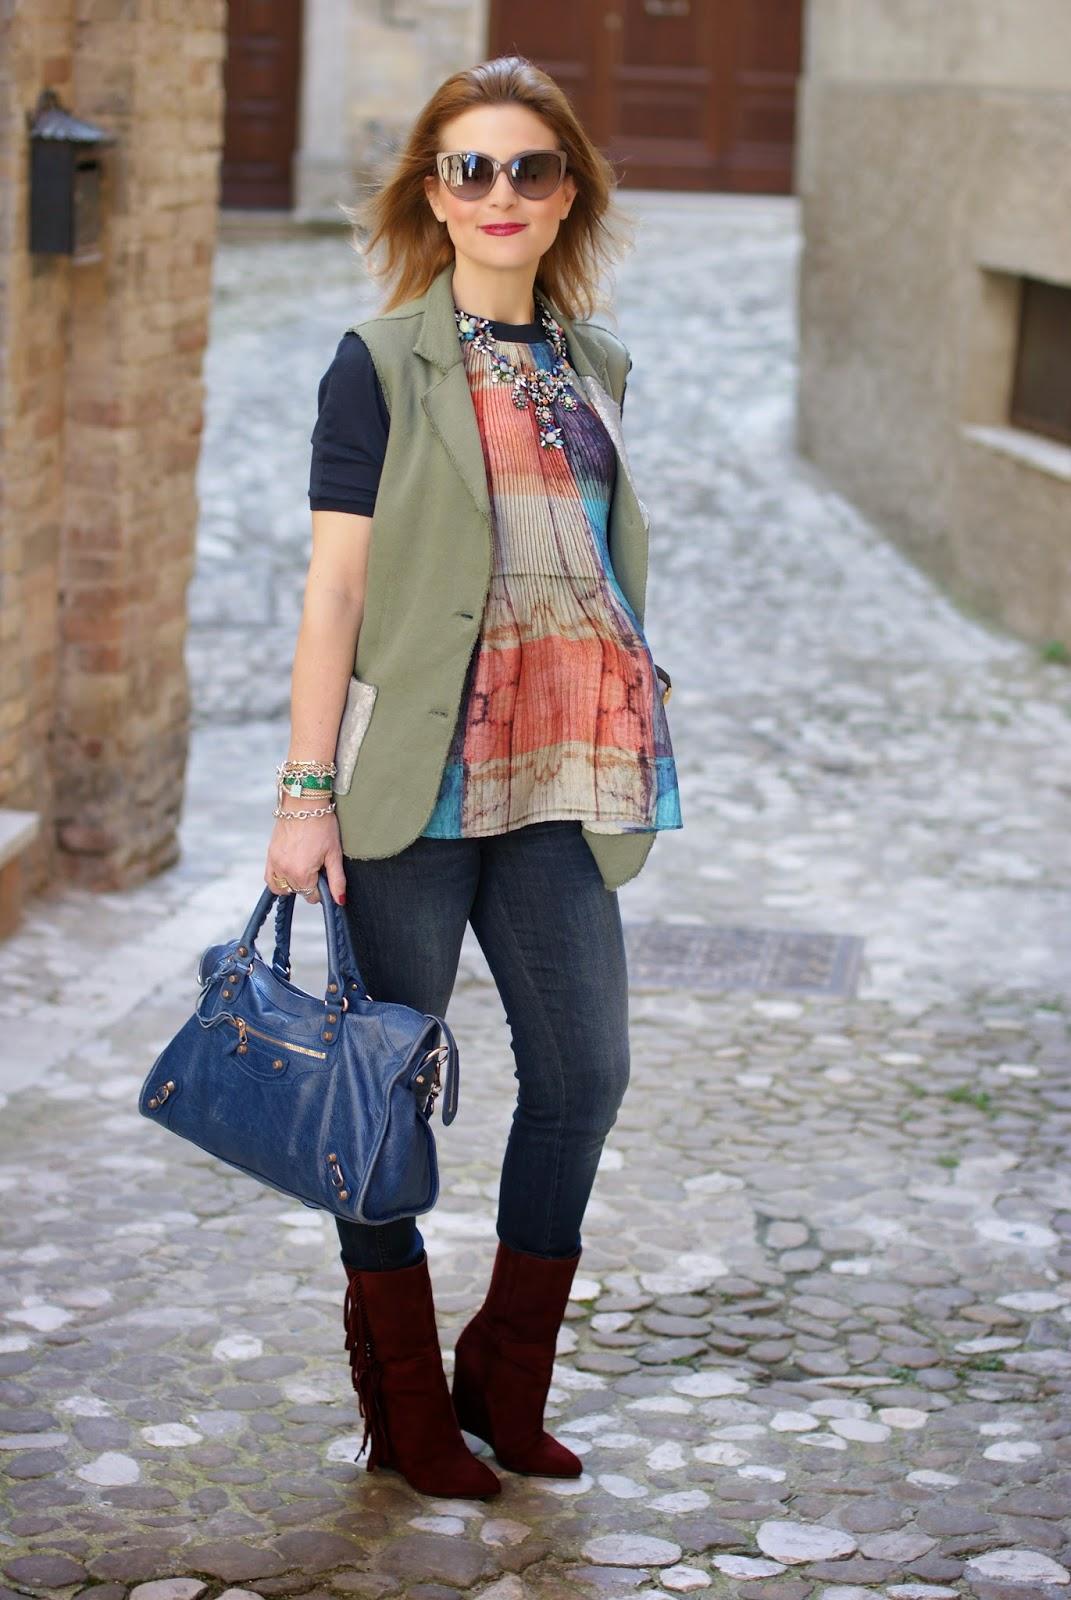 Praio sleeveless jacket, Zara pleated top, Balenciaga City blue, Fashion and Cookies, fashion blogger